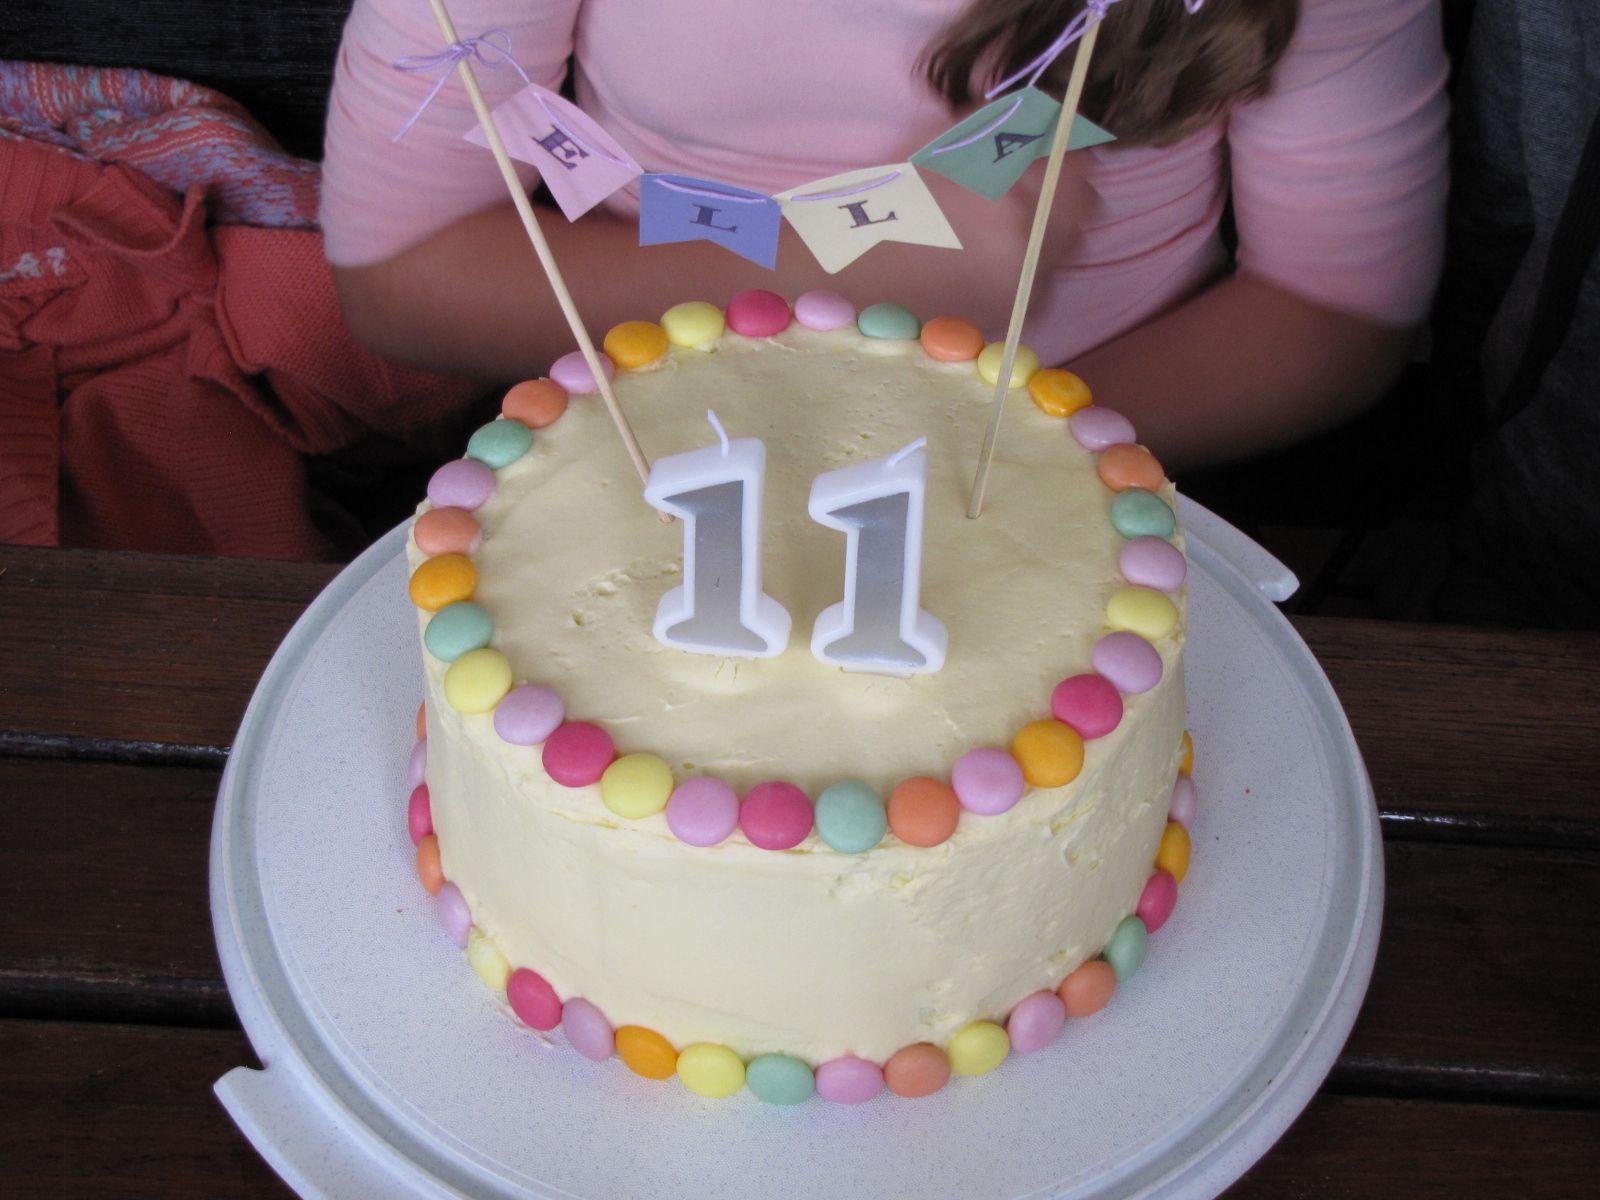 11 Year Old Birthday Cake Decor Party Cakes Cake Birthday Cake